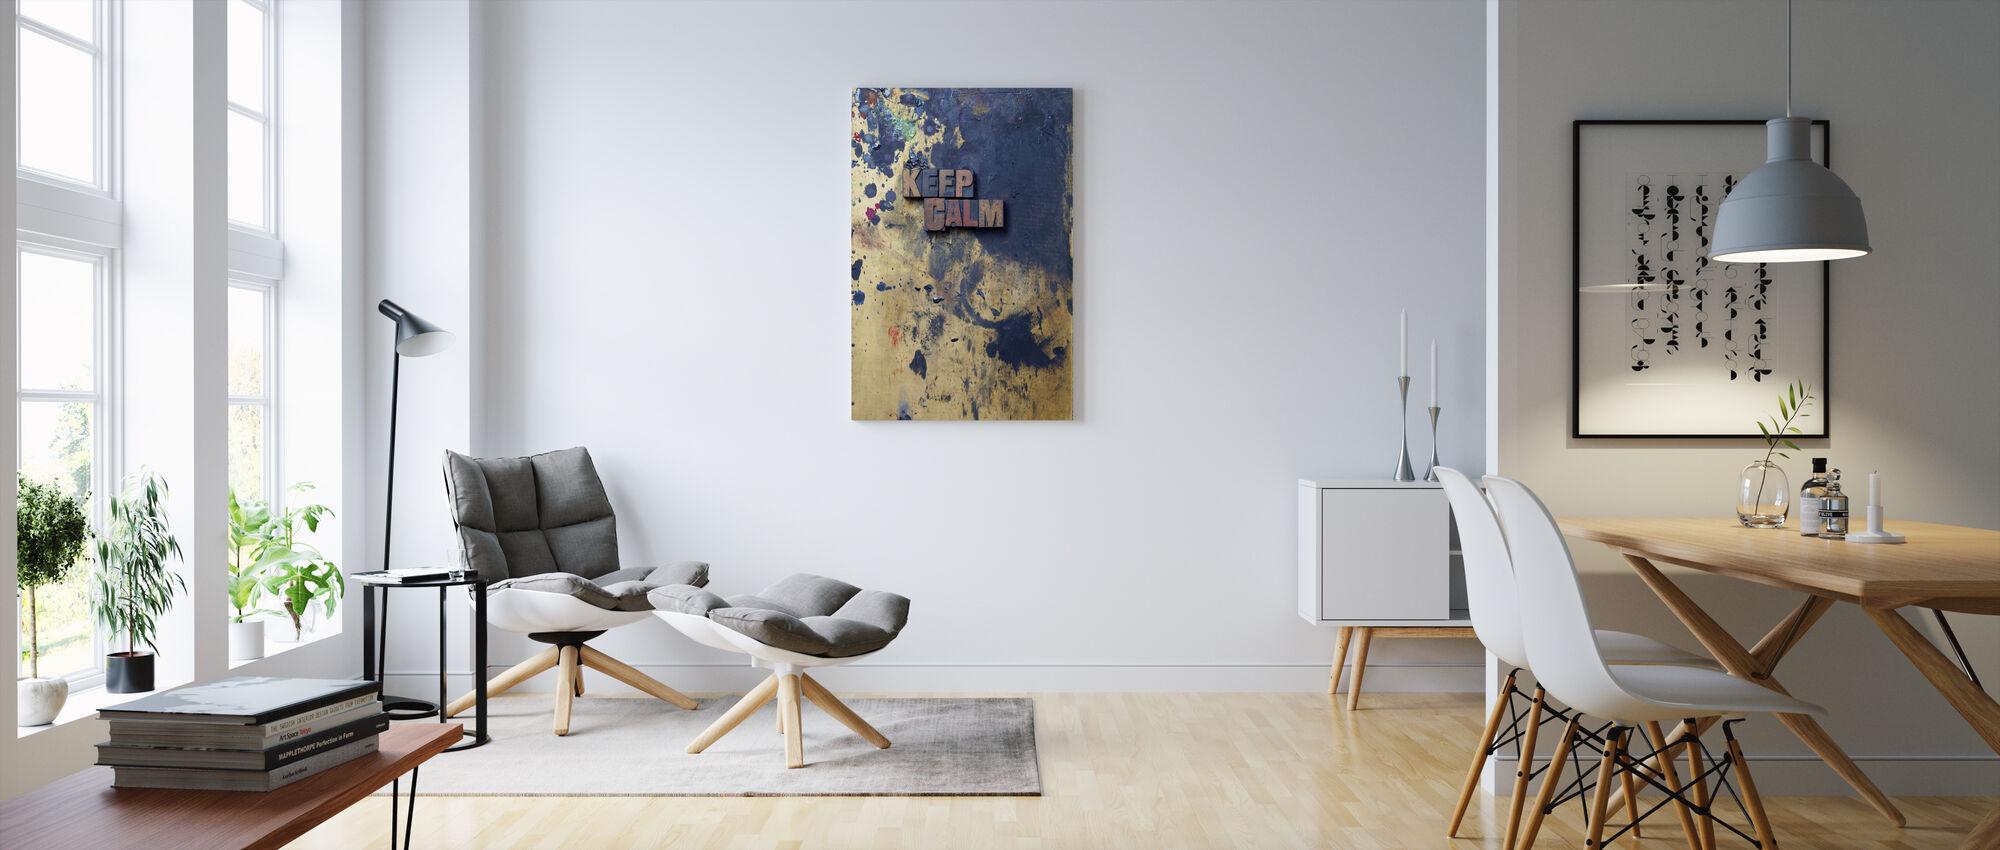 Keep Calm - Canvas print - Living Room